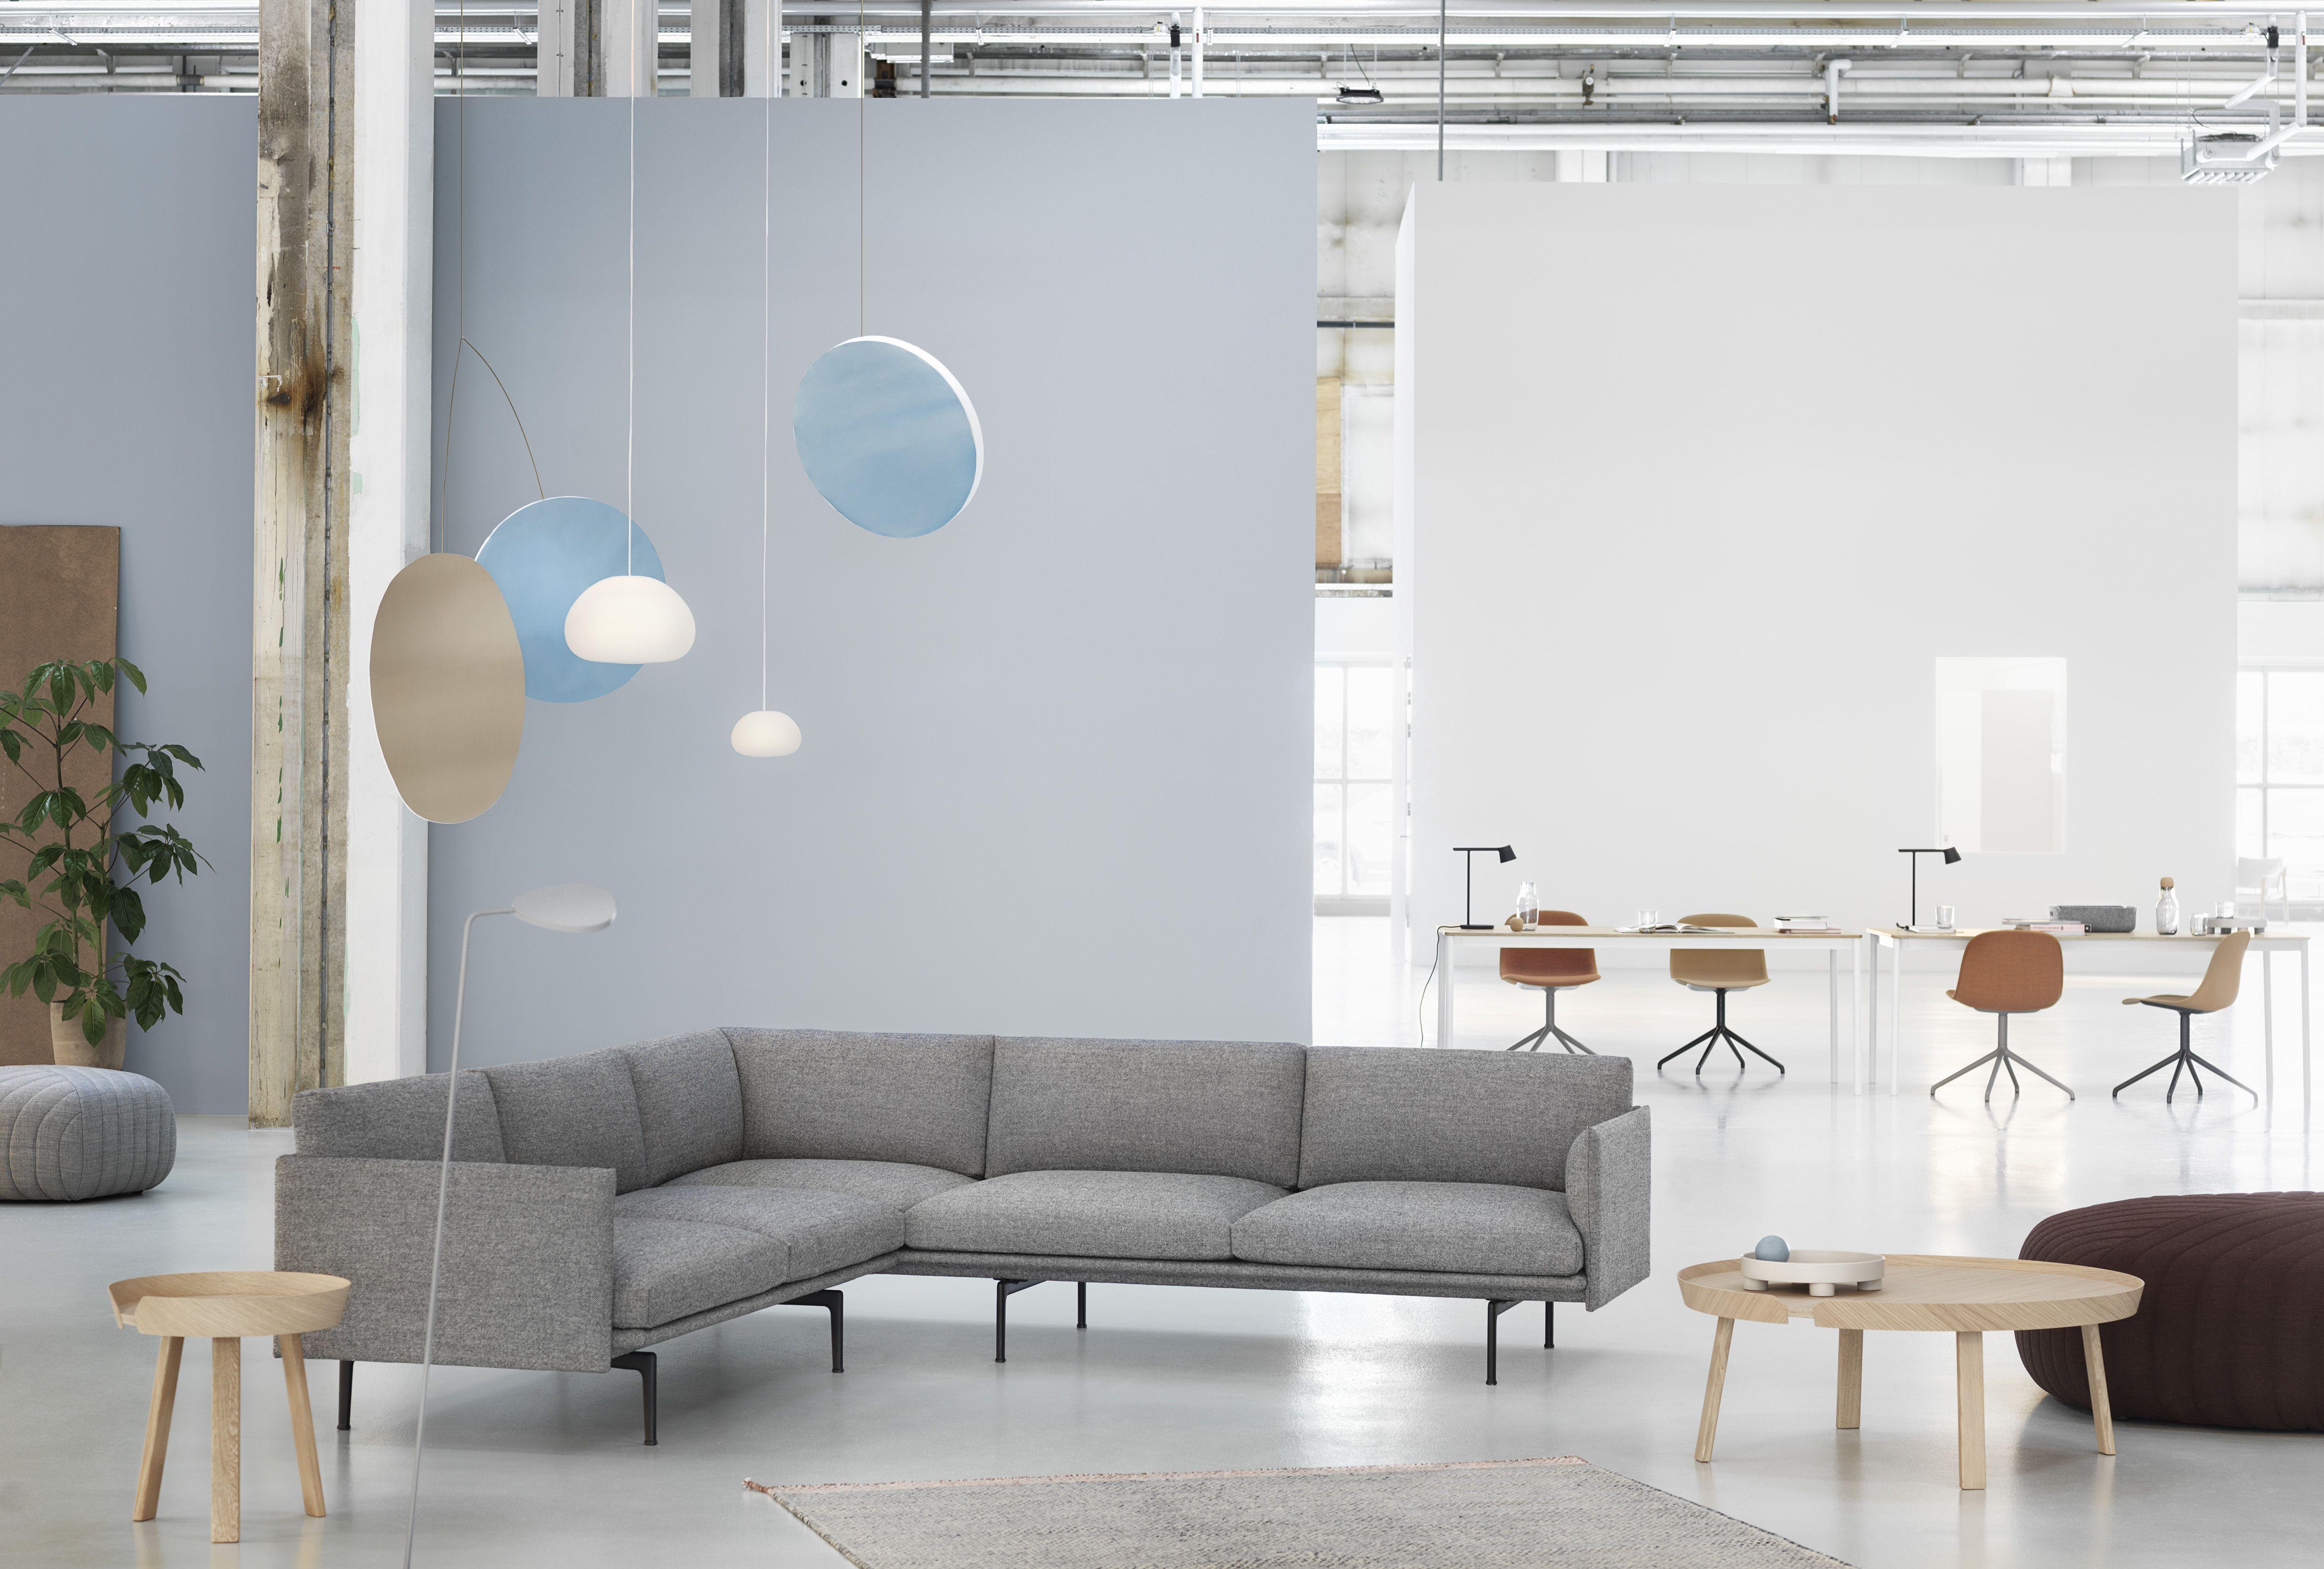 Embodying The Design Language Of The Outline Sofa Series Is The Outline Corner Sofa An Angular Ta Scandinavian Sofa Design Corner Sofa How To Make Corner Sofa